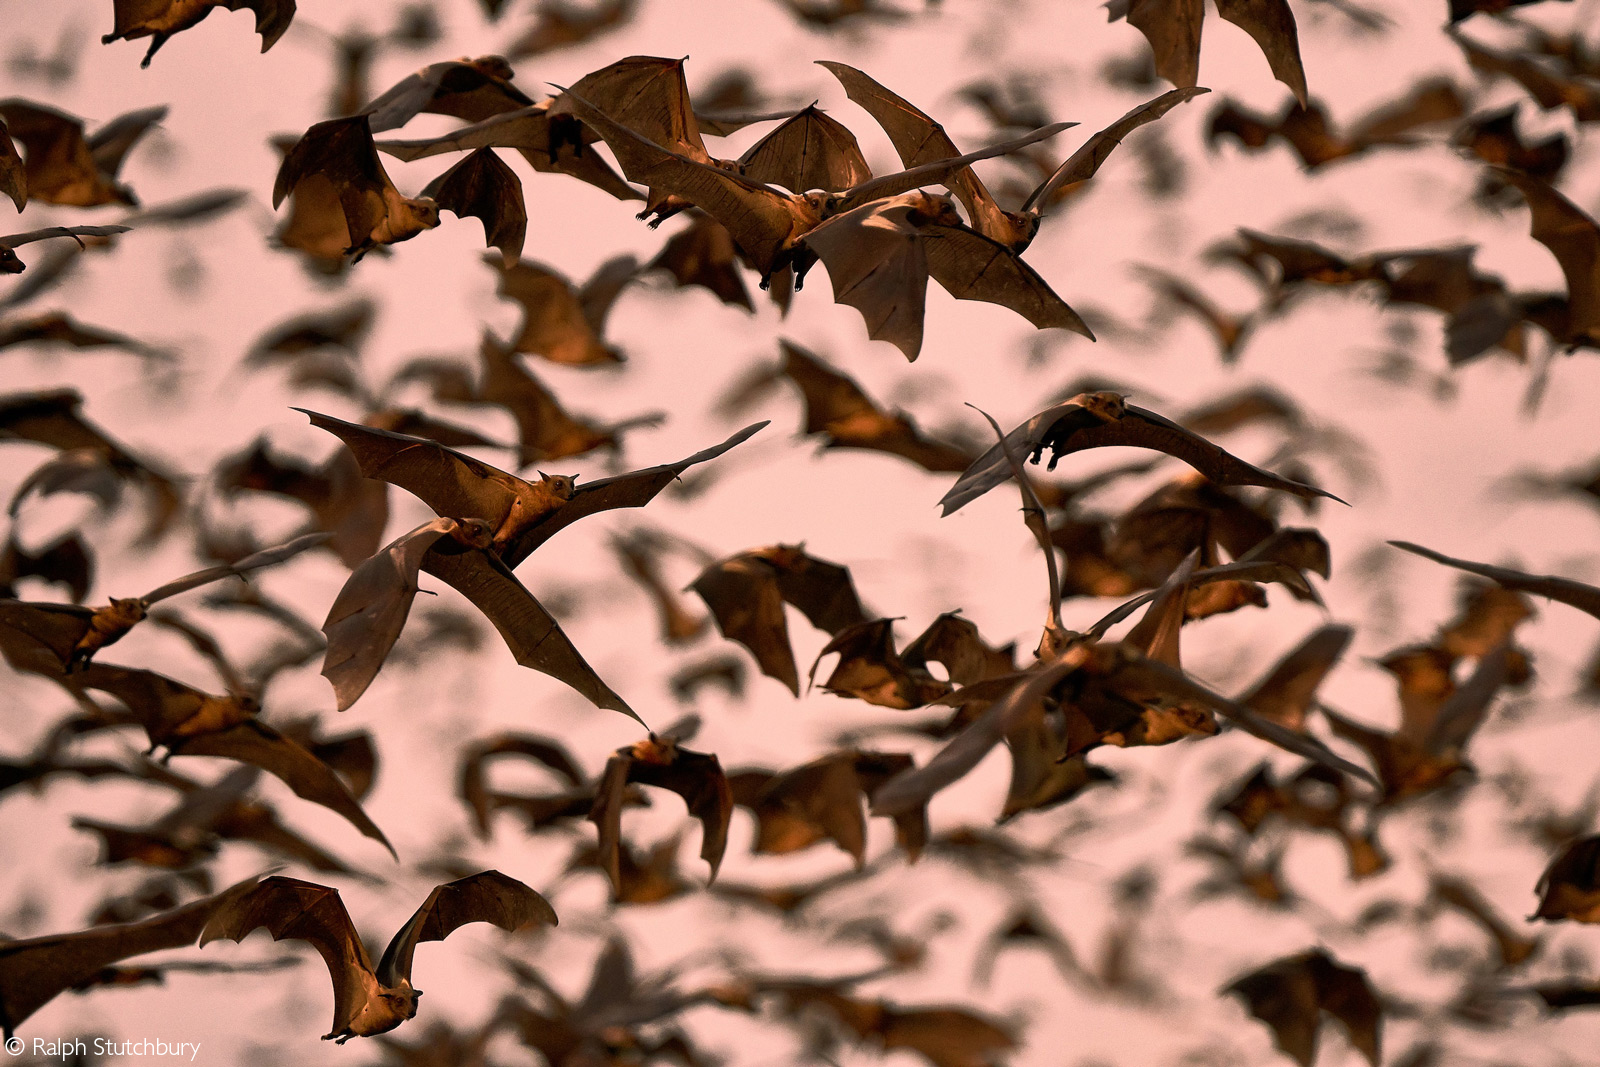 Straw-coloured fruit bats. Kasanka National Park, Zambia © Ralph Stutchbury